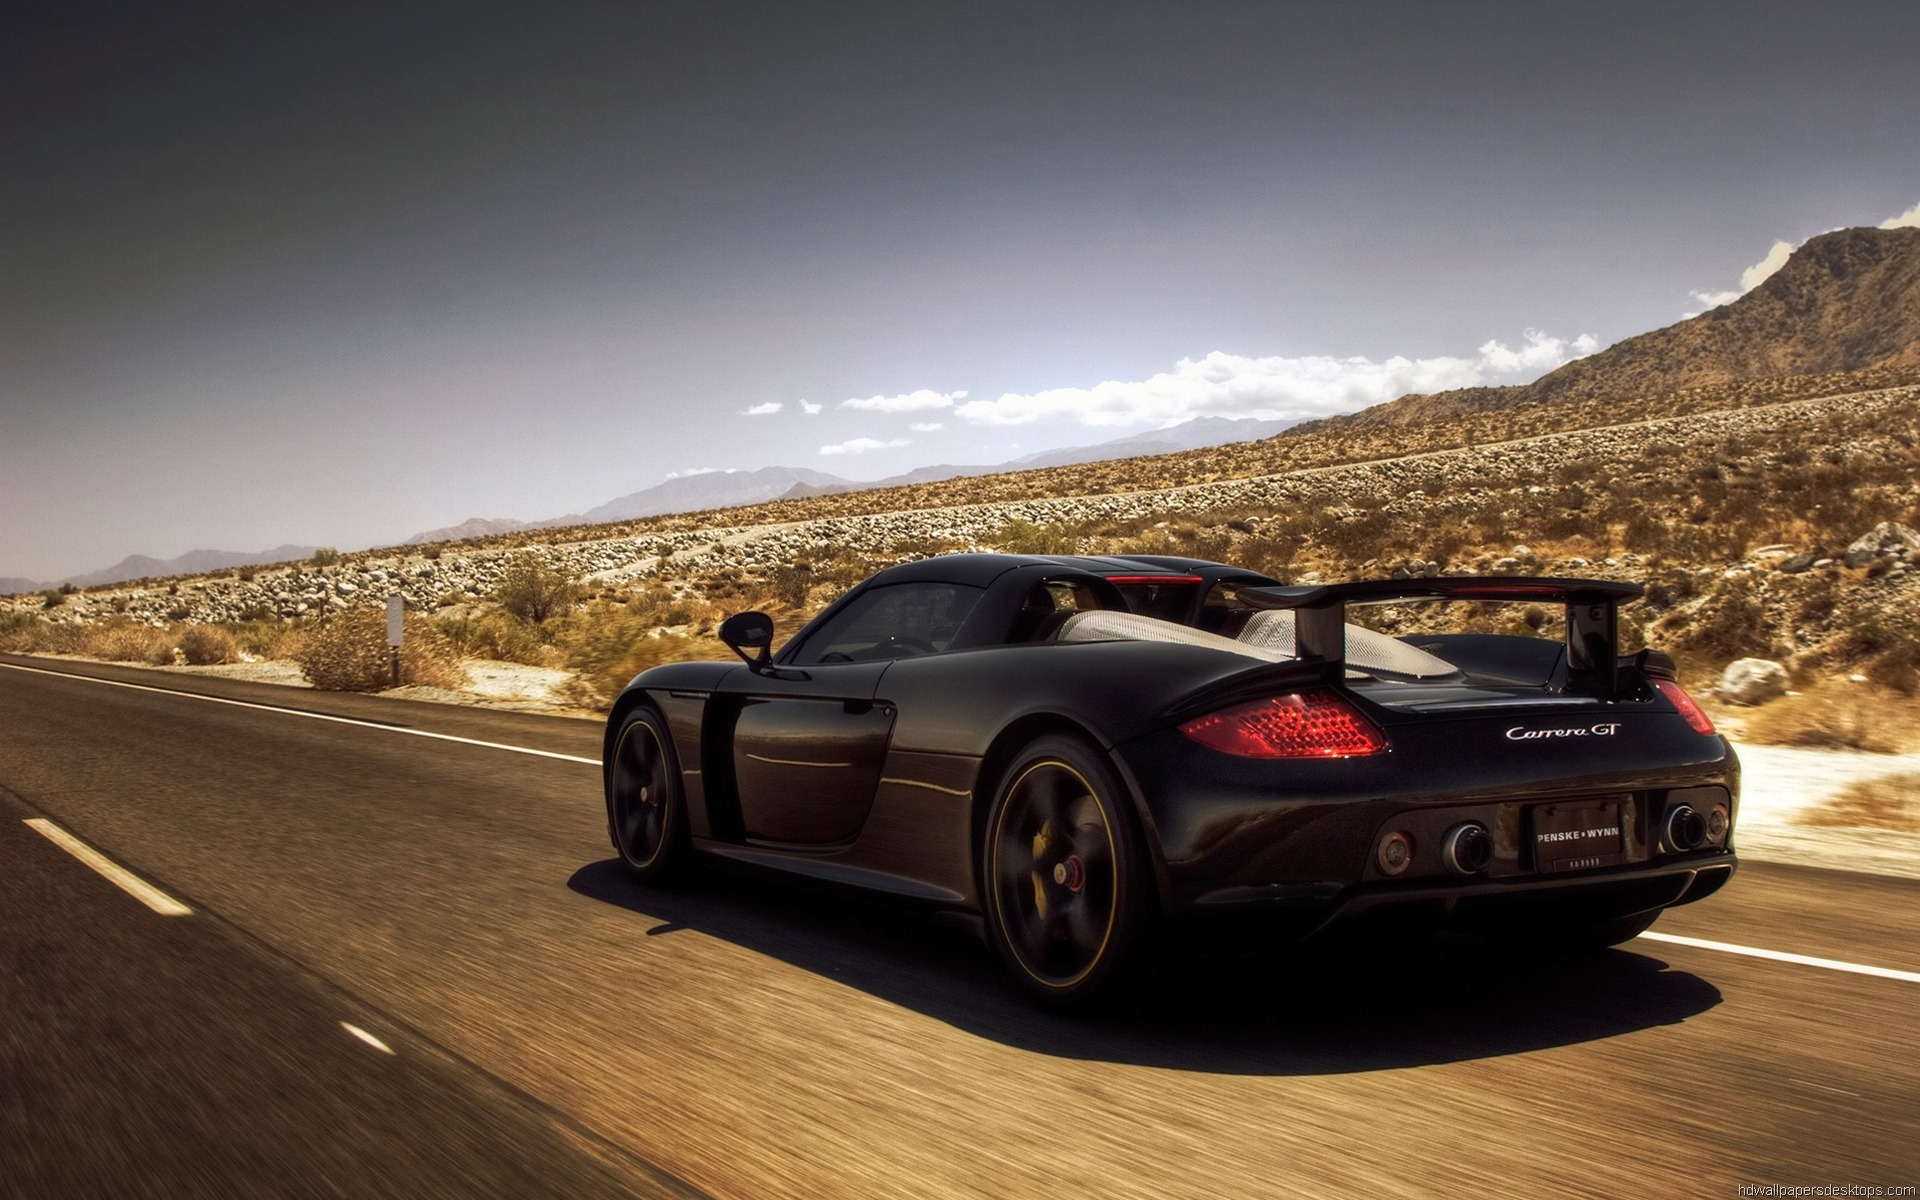 Cars Wallpaper HD Full HD 1080p Desktop Background 386 1920x1200 1920x1200